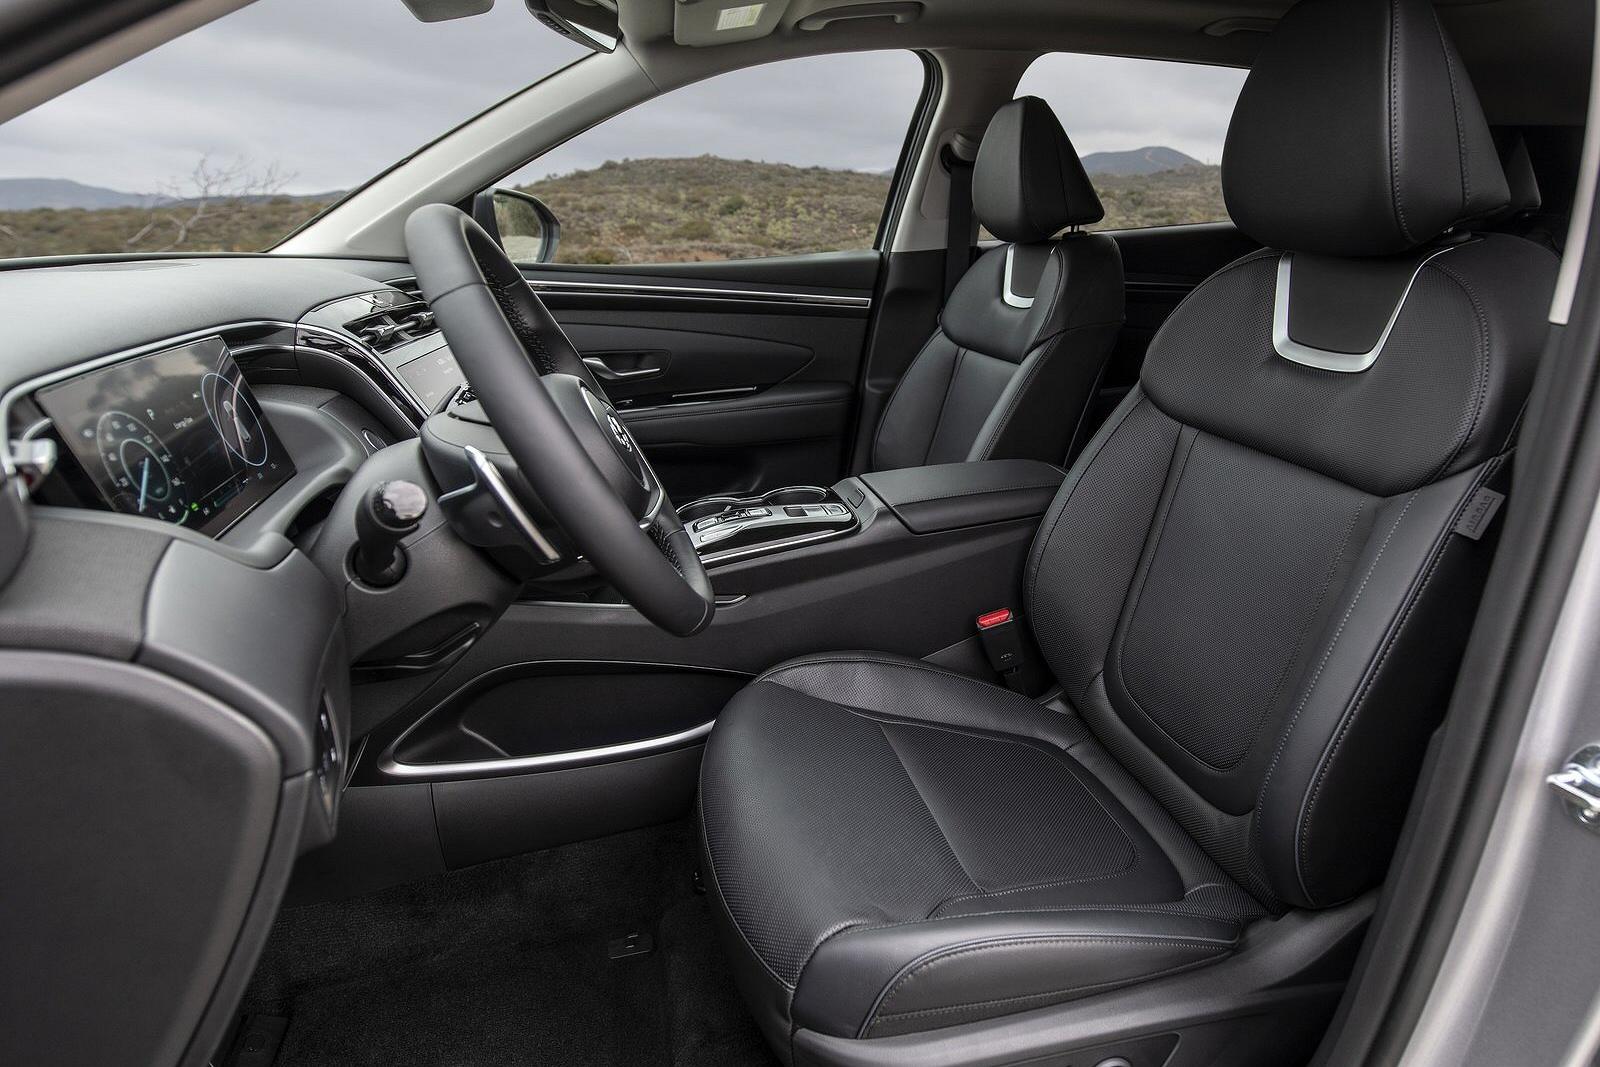 HYUNDAI TUCSON ESTATE 1.6 TGDi Plug-in Hybrid Premium 5dr 4WD Auto